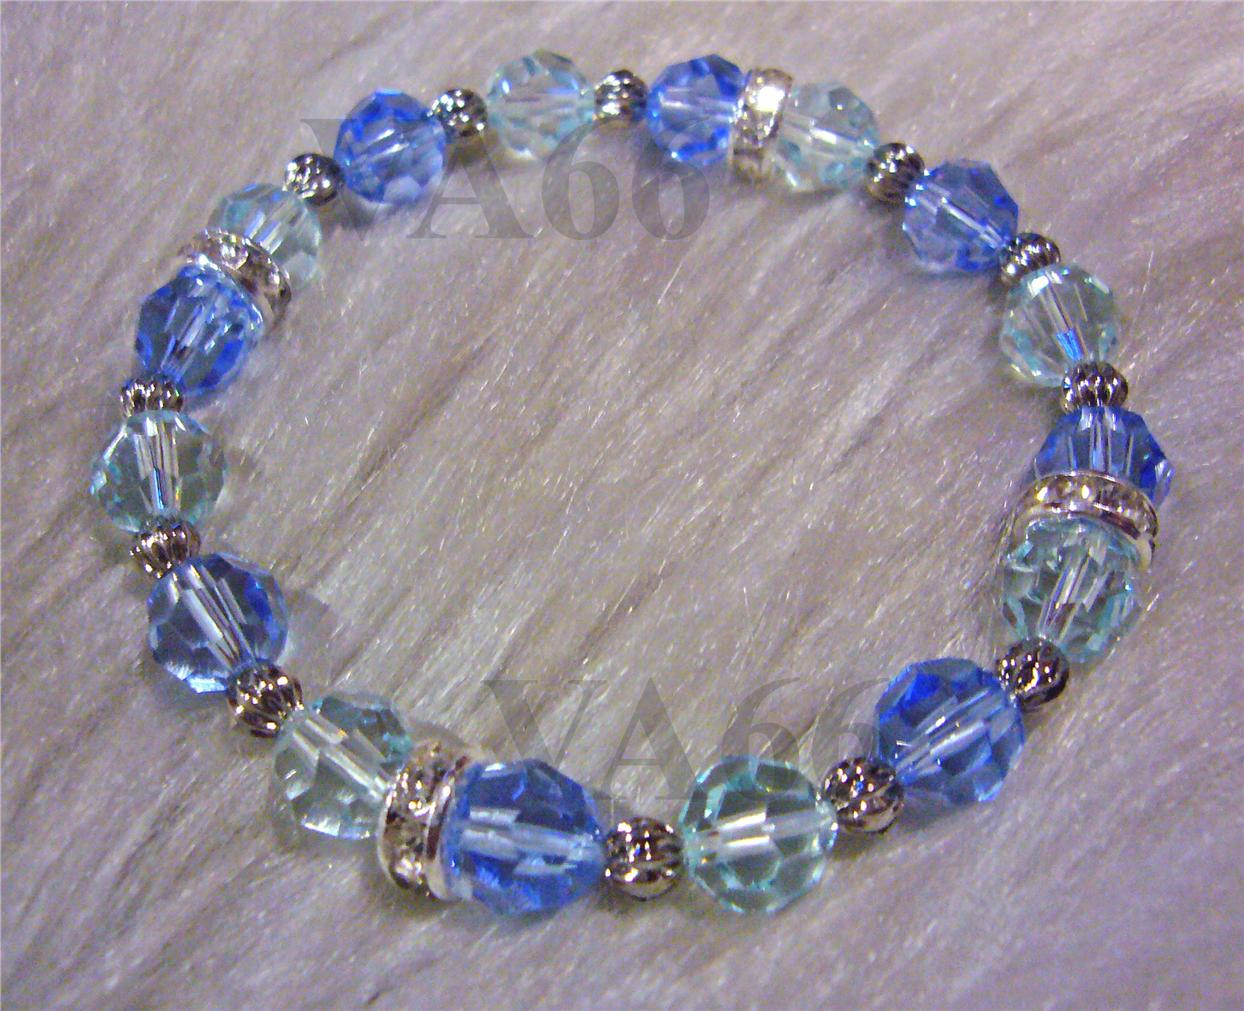 Elastic Stretch Swarovski Crystal Bracelet Blue Diamond Gift Fits All